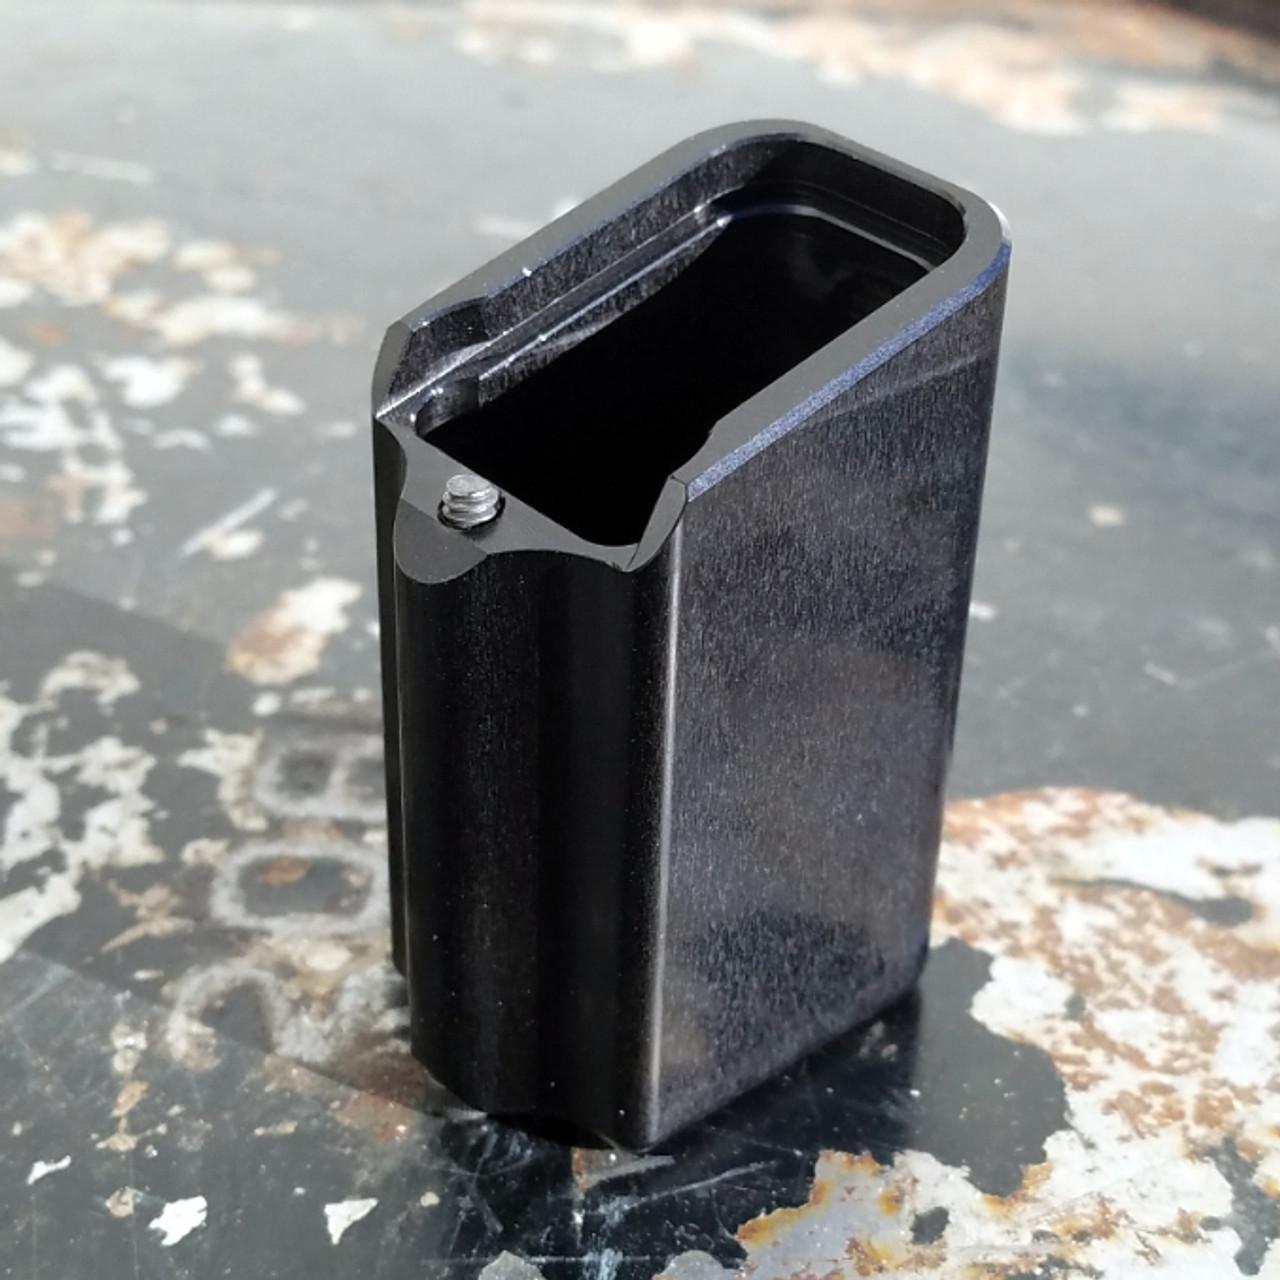 Canik Plus 9 - 170mm - Basepad - Black